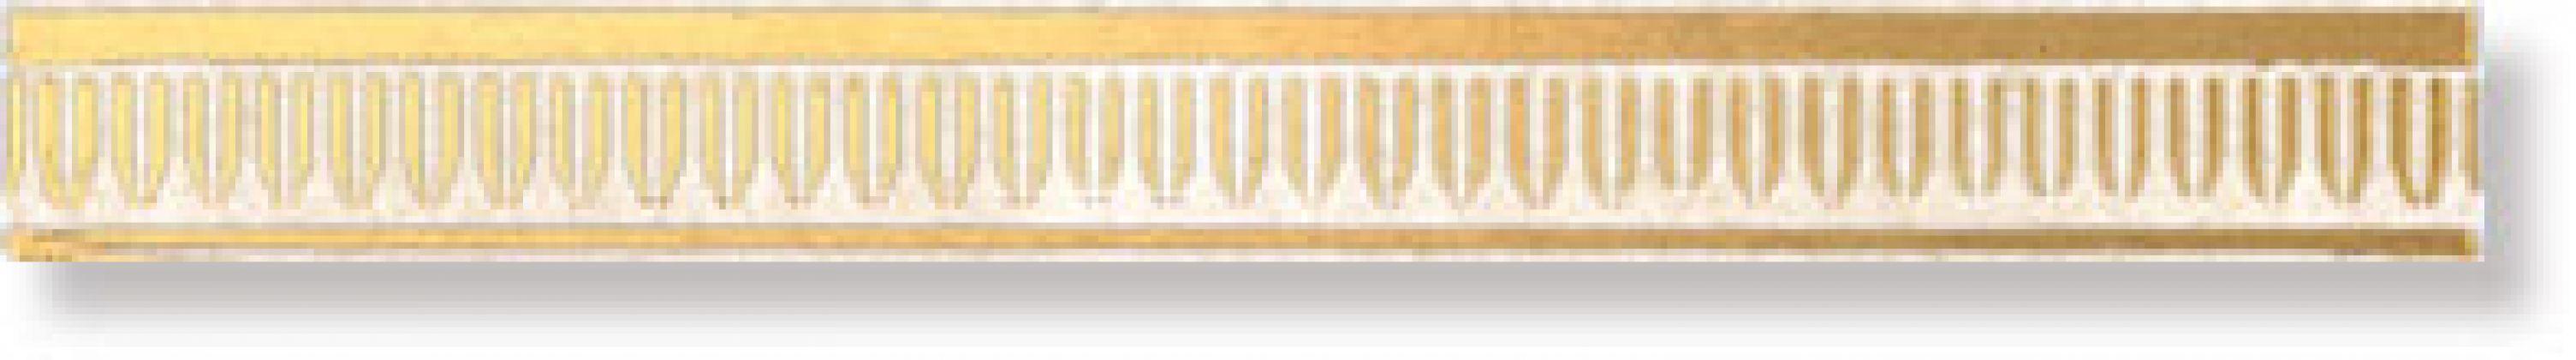 Бордюр A1553/11006 Пикадилли 3x30